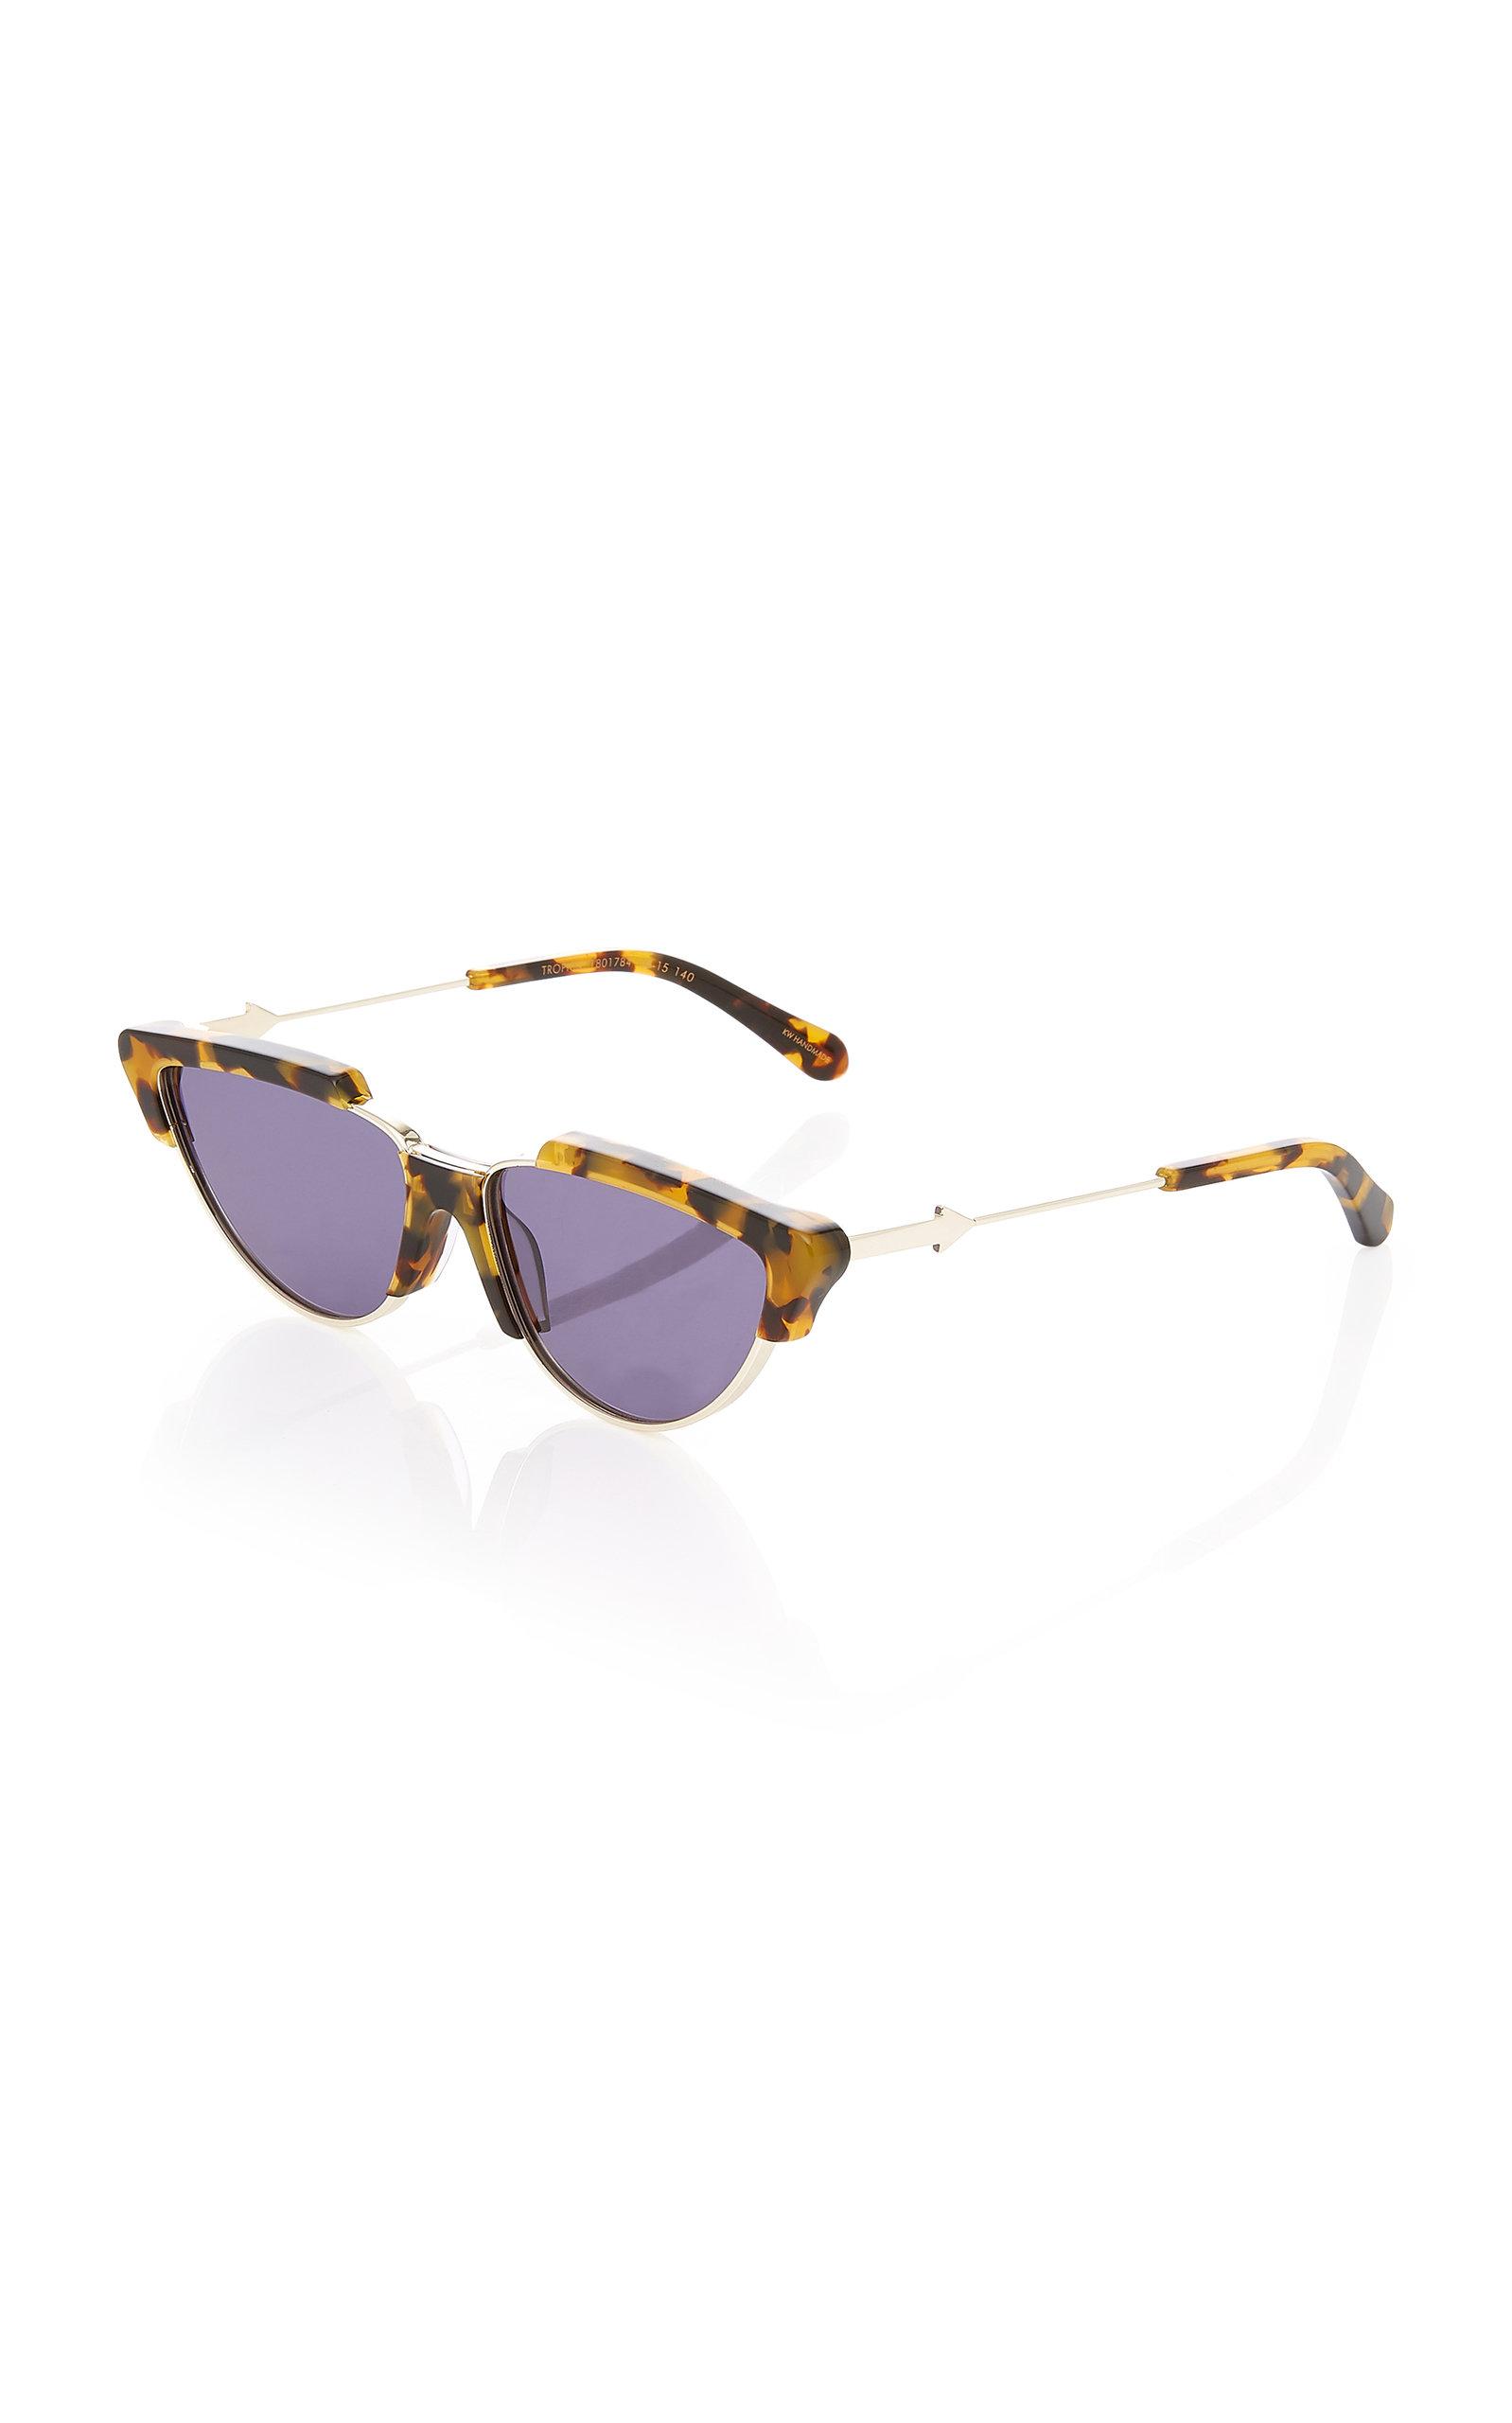 acetato Walker Gafas ojo de marrón gato en de sol Tropics de de Karen Bgz1R